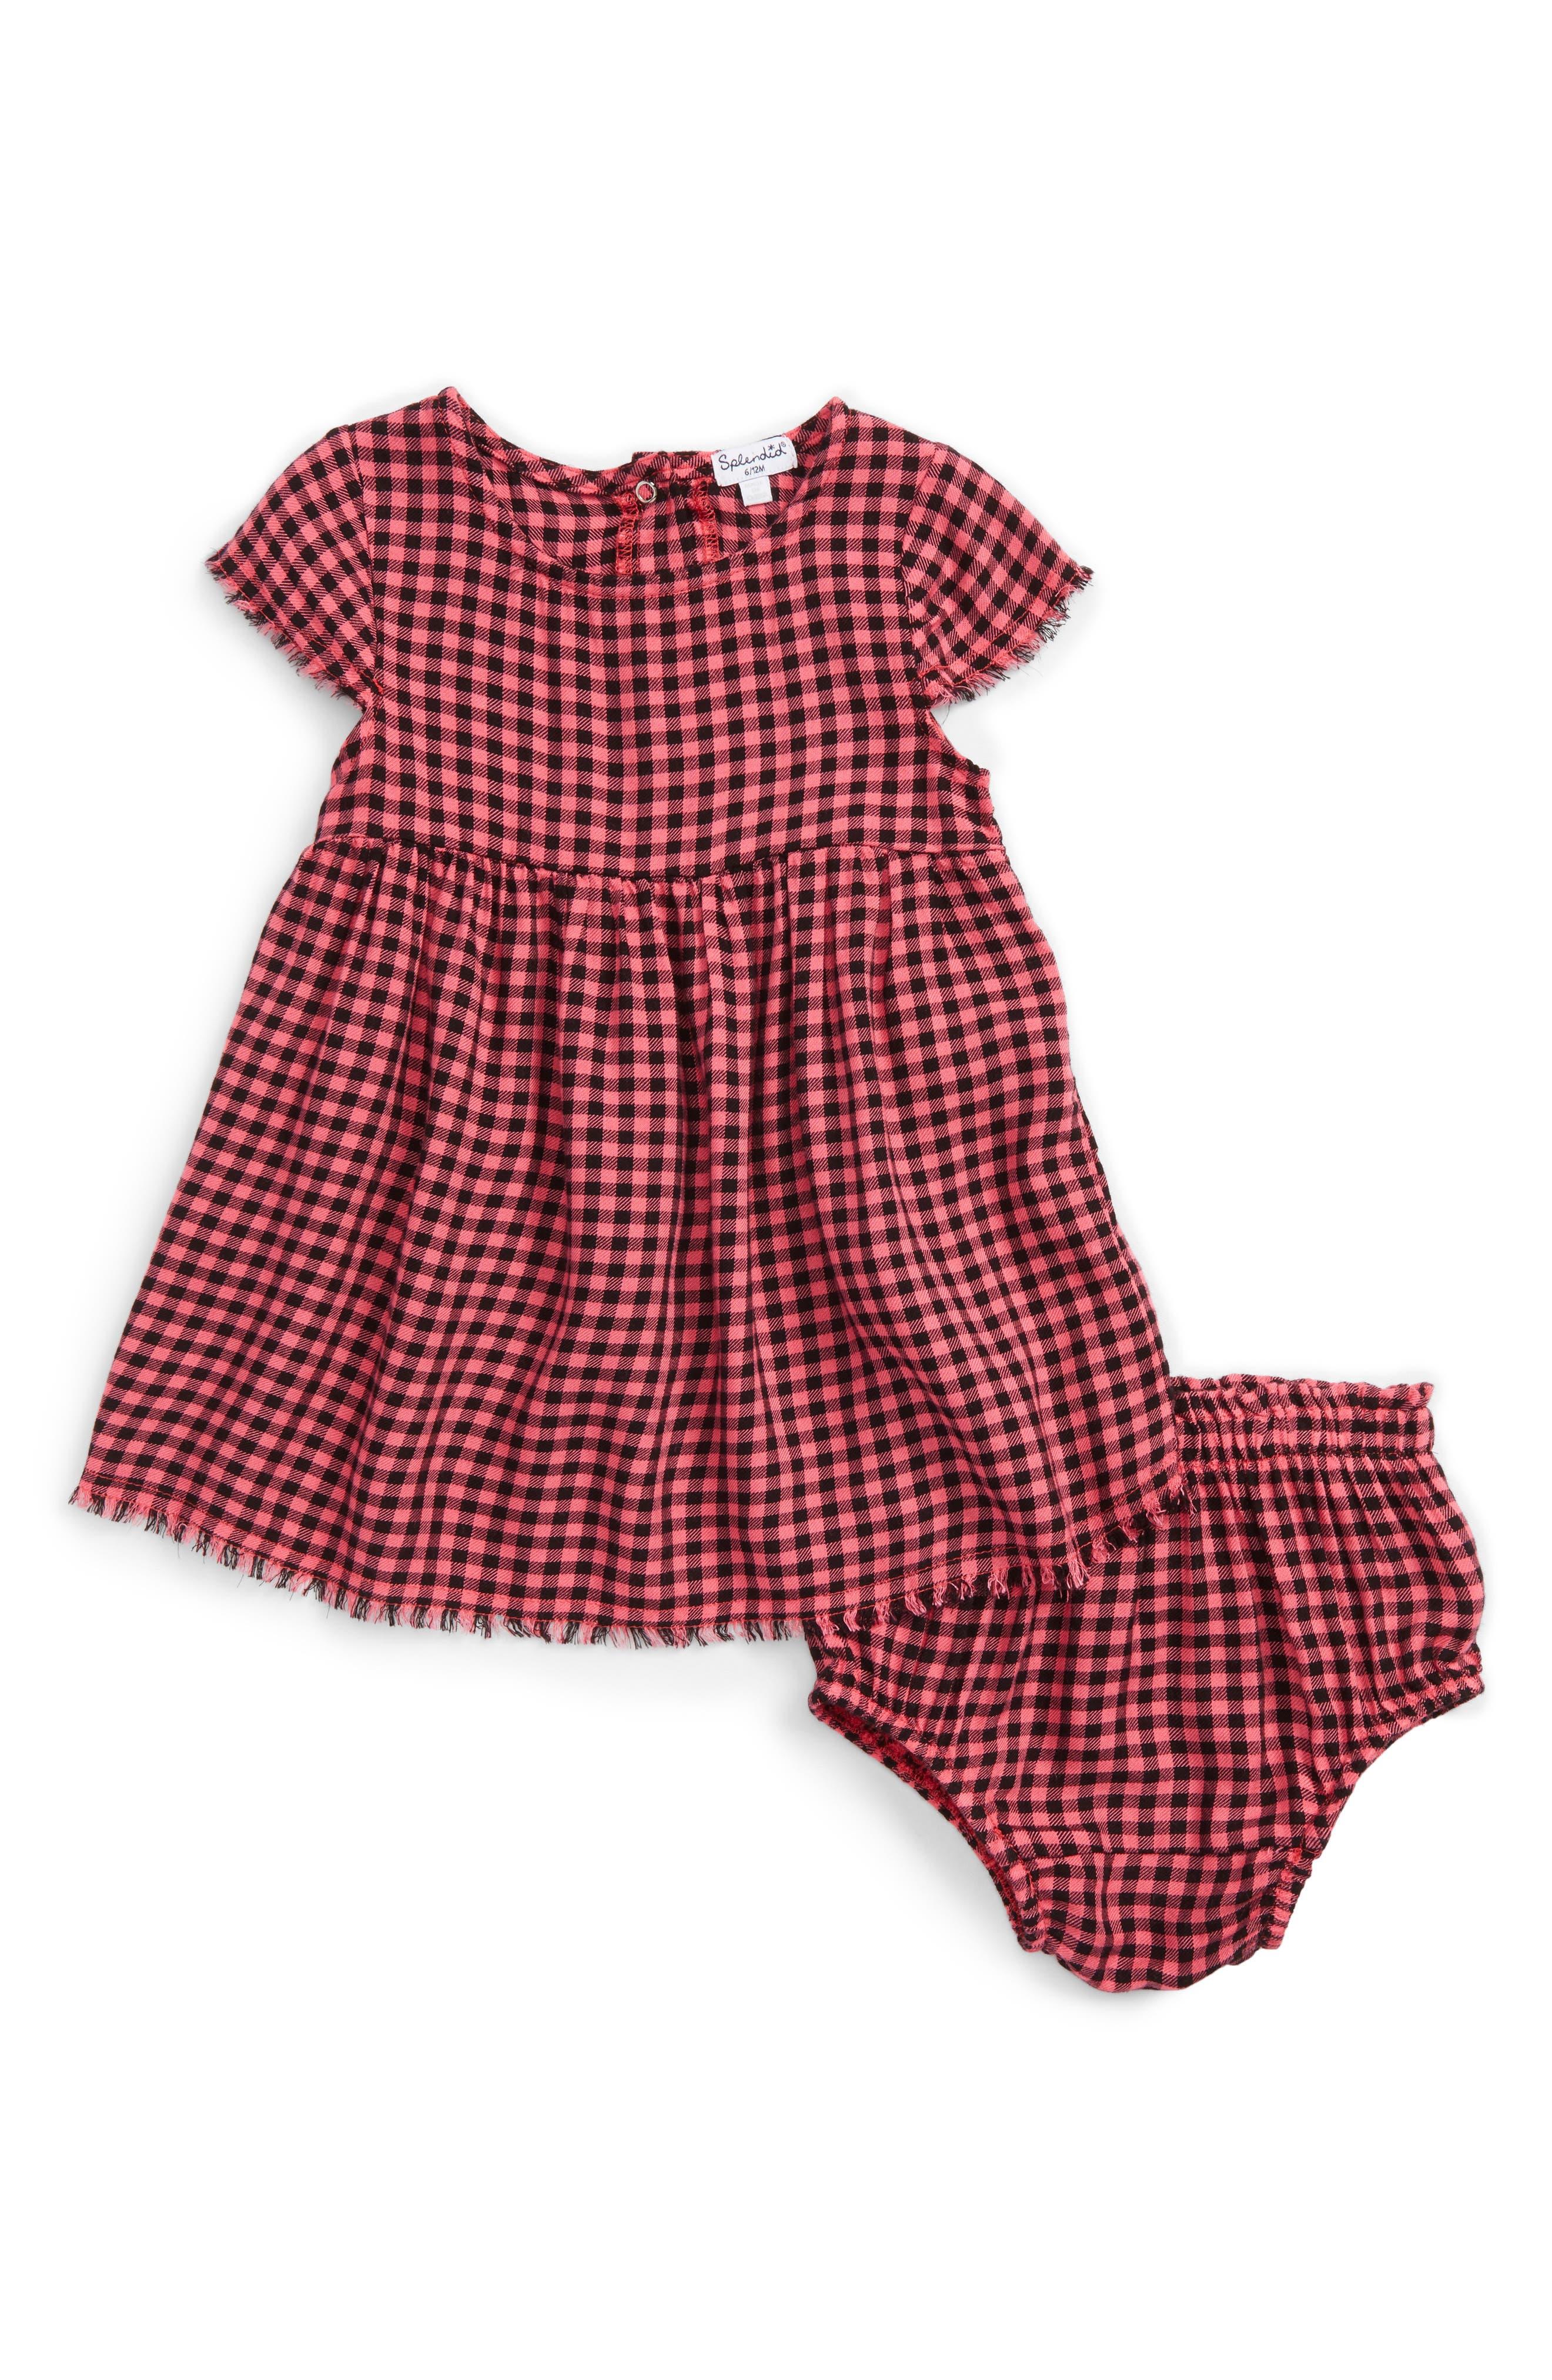 Splendid Plaid Dress Baby Girls